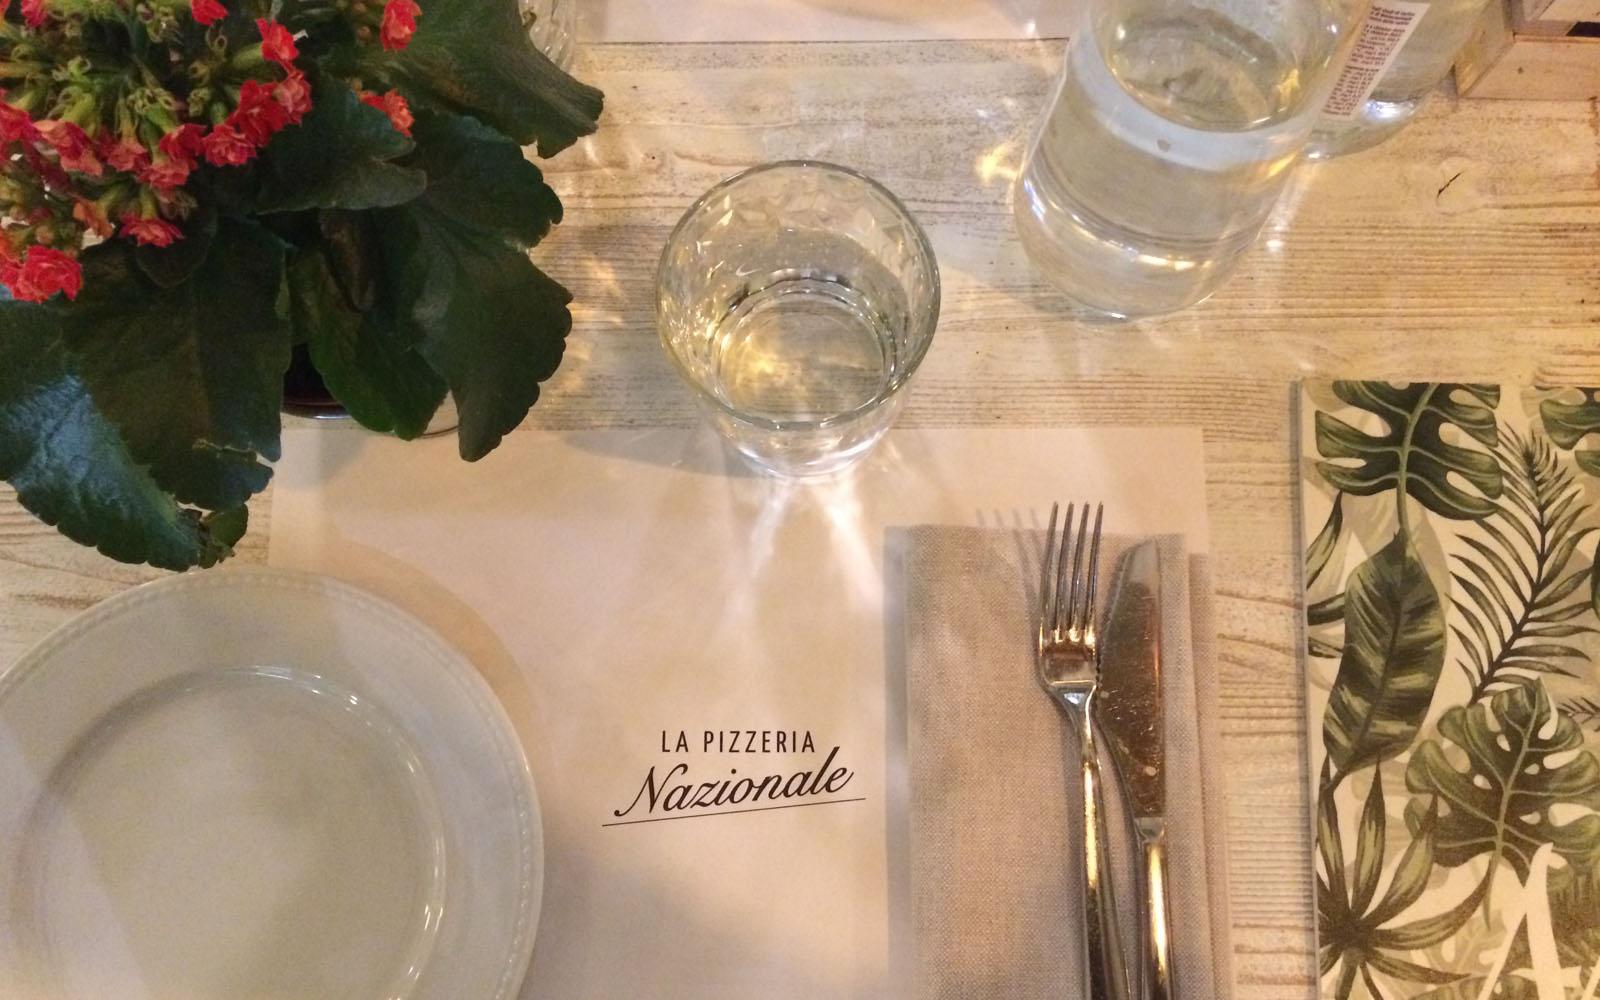 La mise en place easy-glam de La Pizzeria Nazionale di Milano.